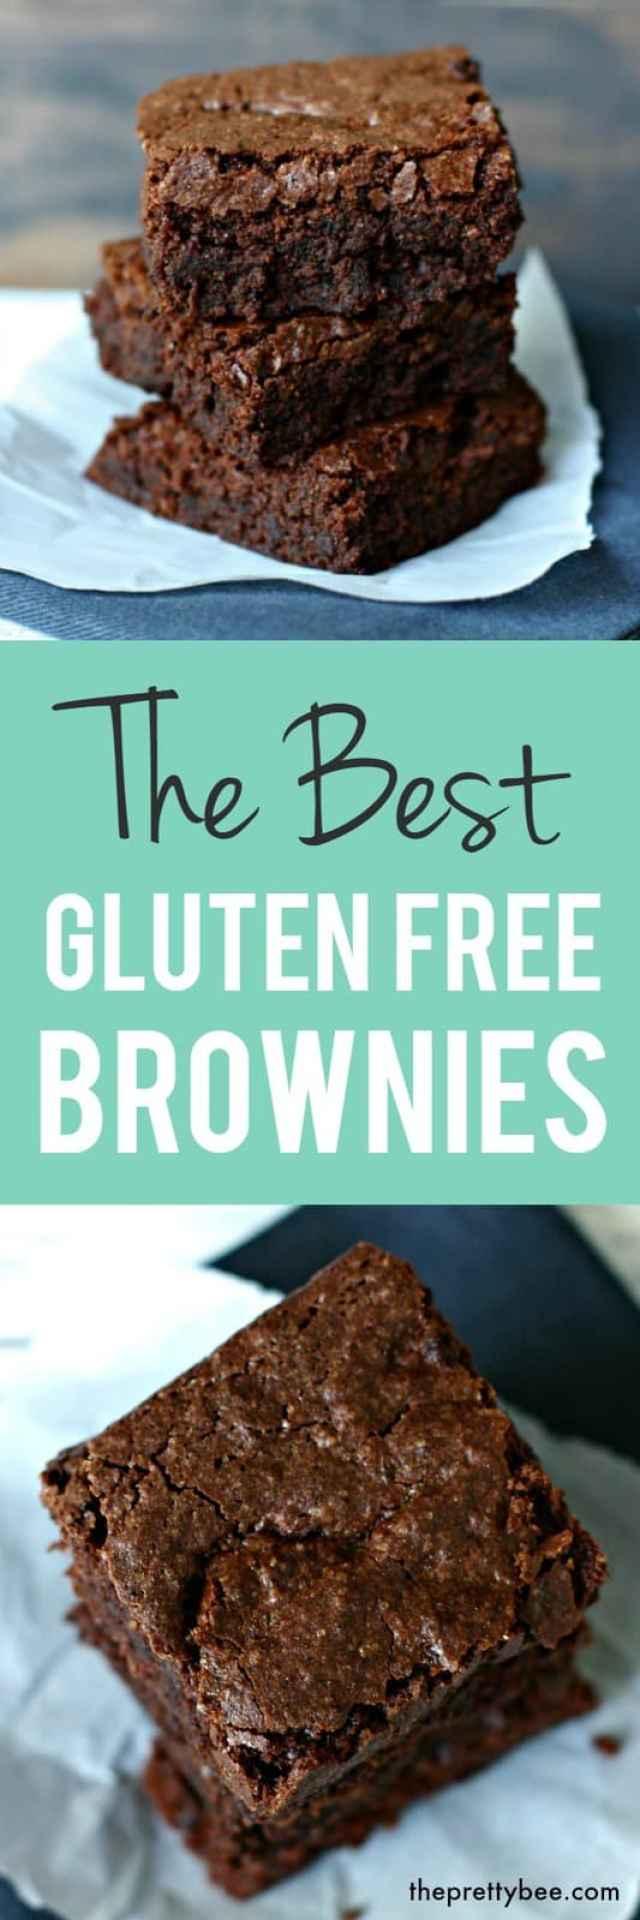 Gluten free brownie recipe - one bowl